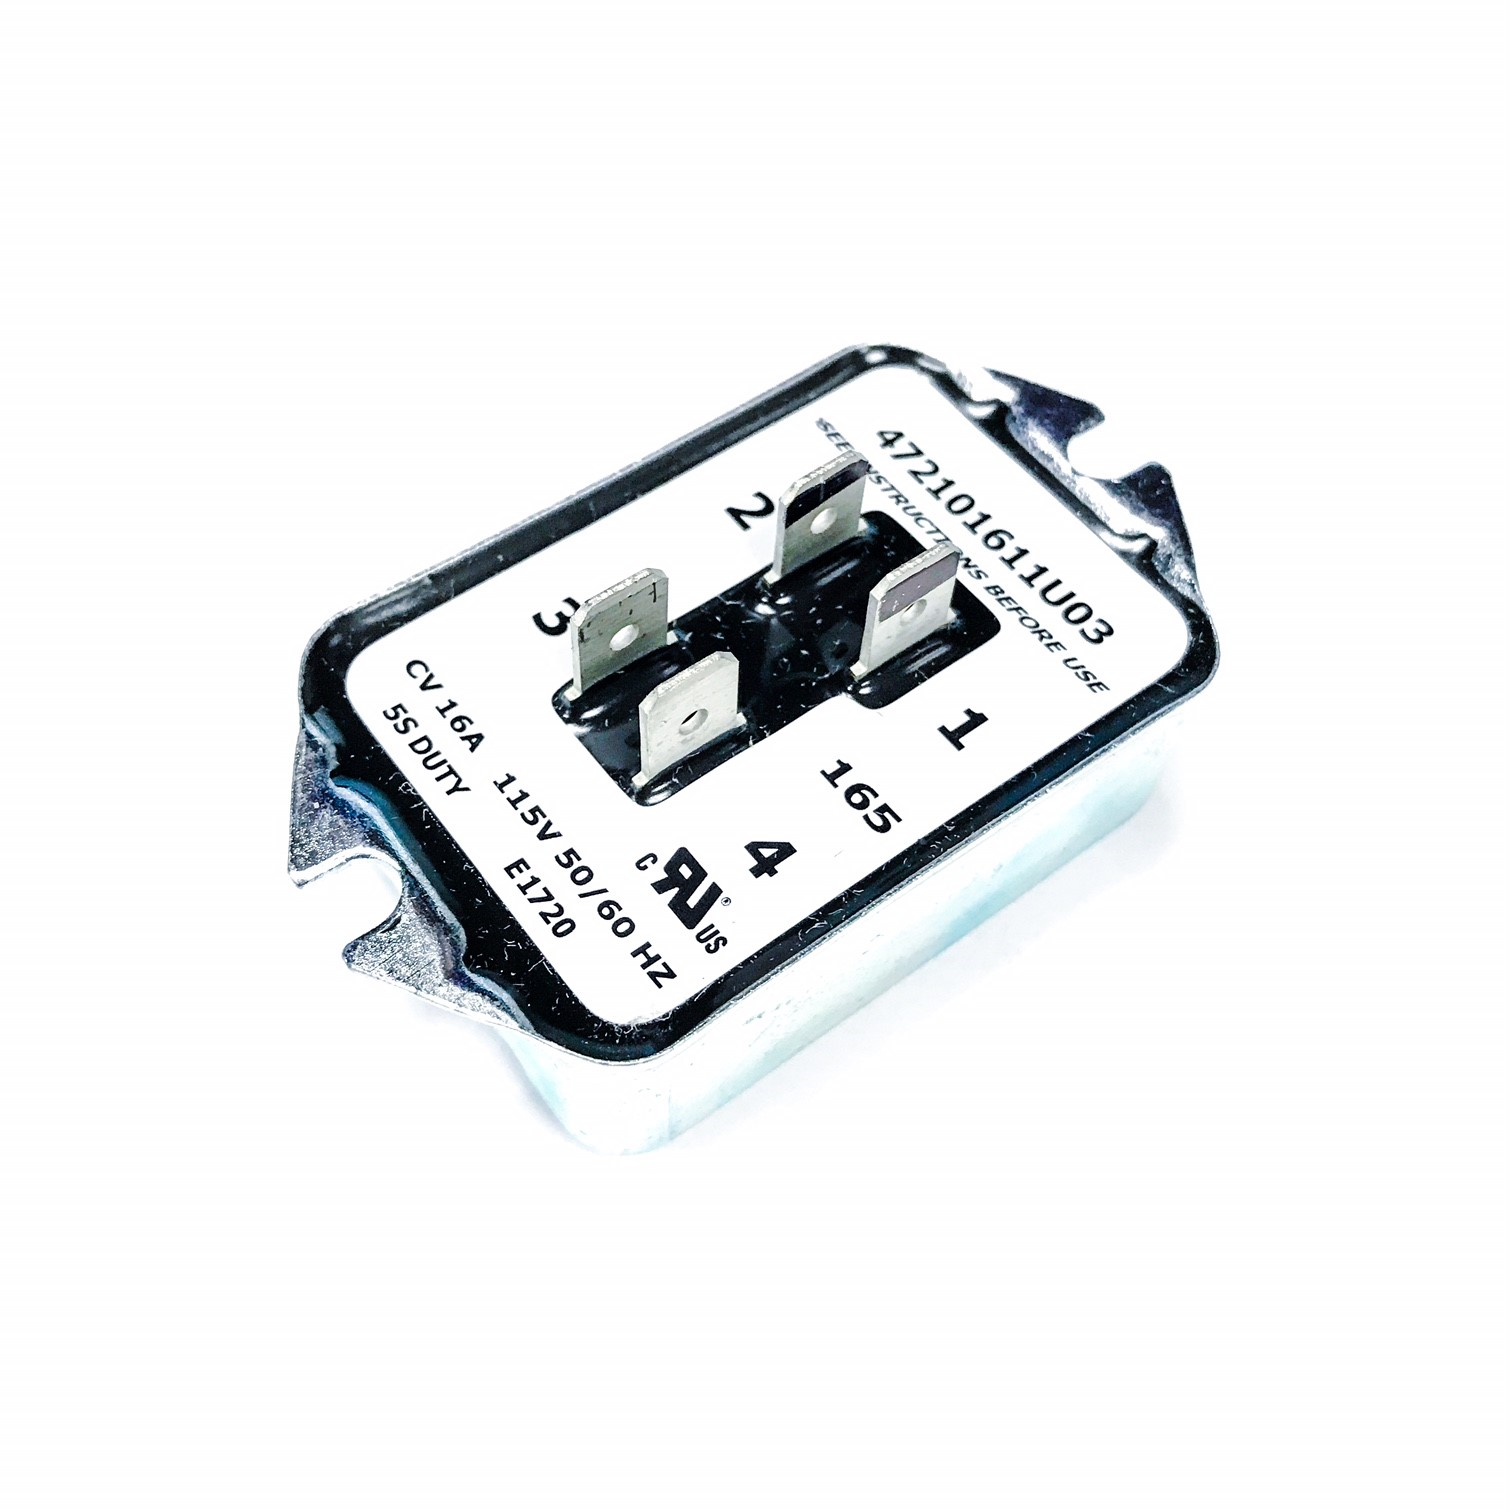 medium resolution of bremas boat lift switch wiring doc diagram salzer drum switch switches wiring reversing